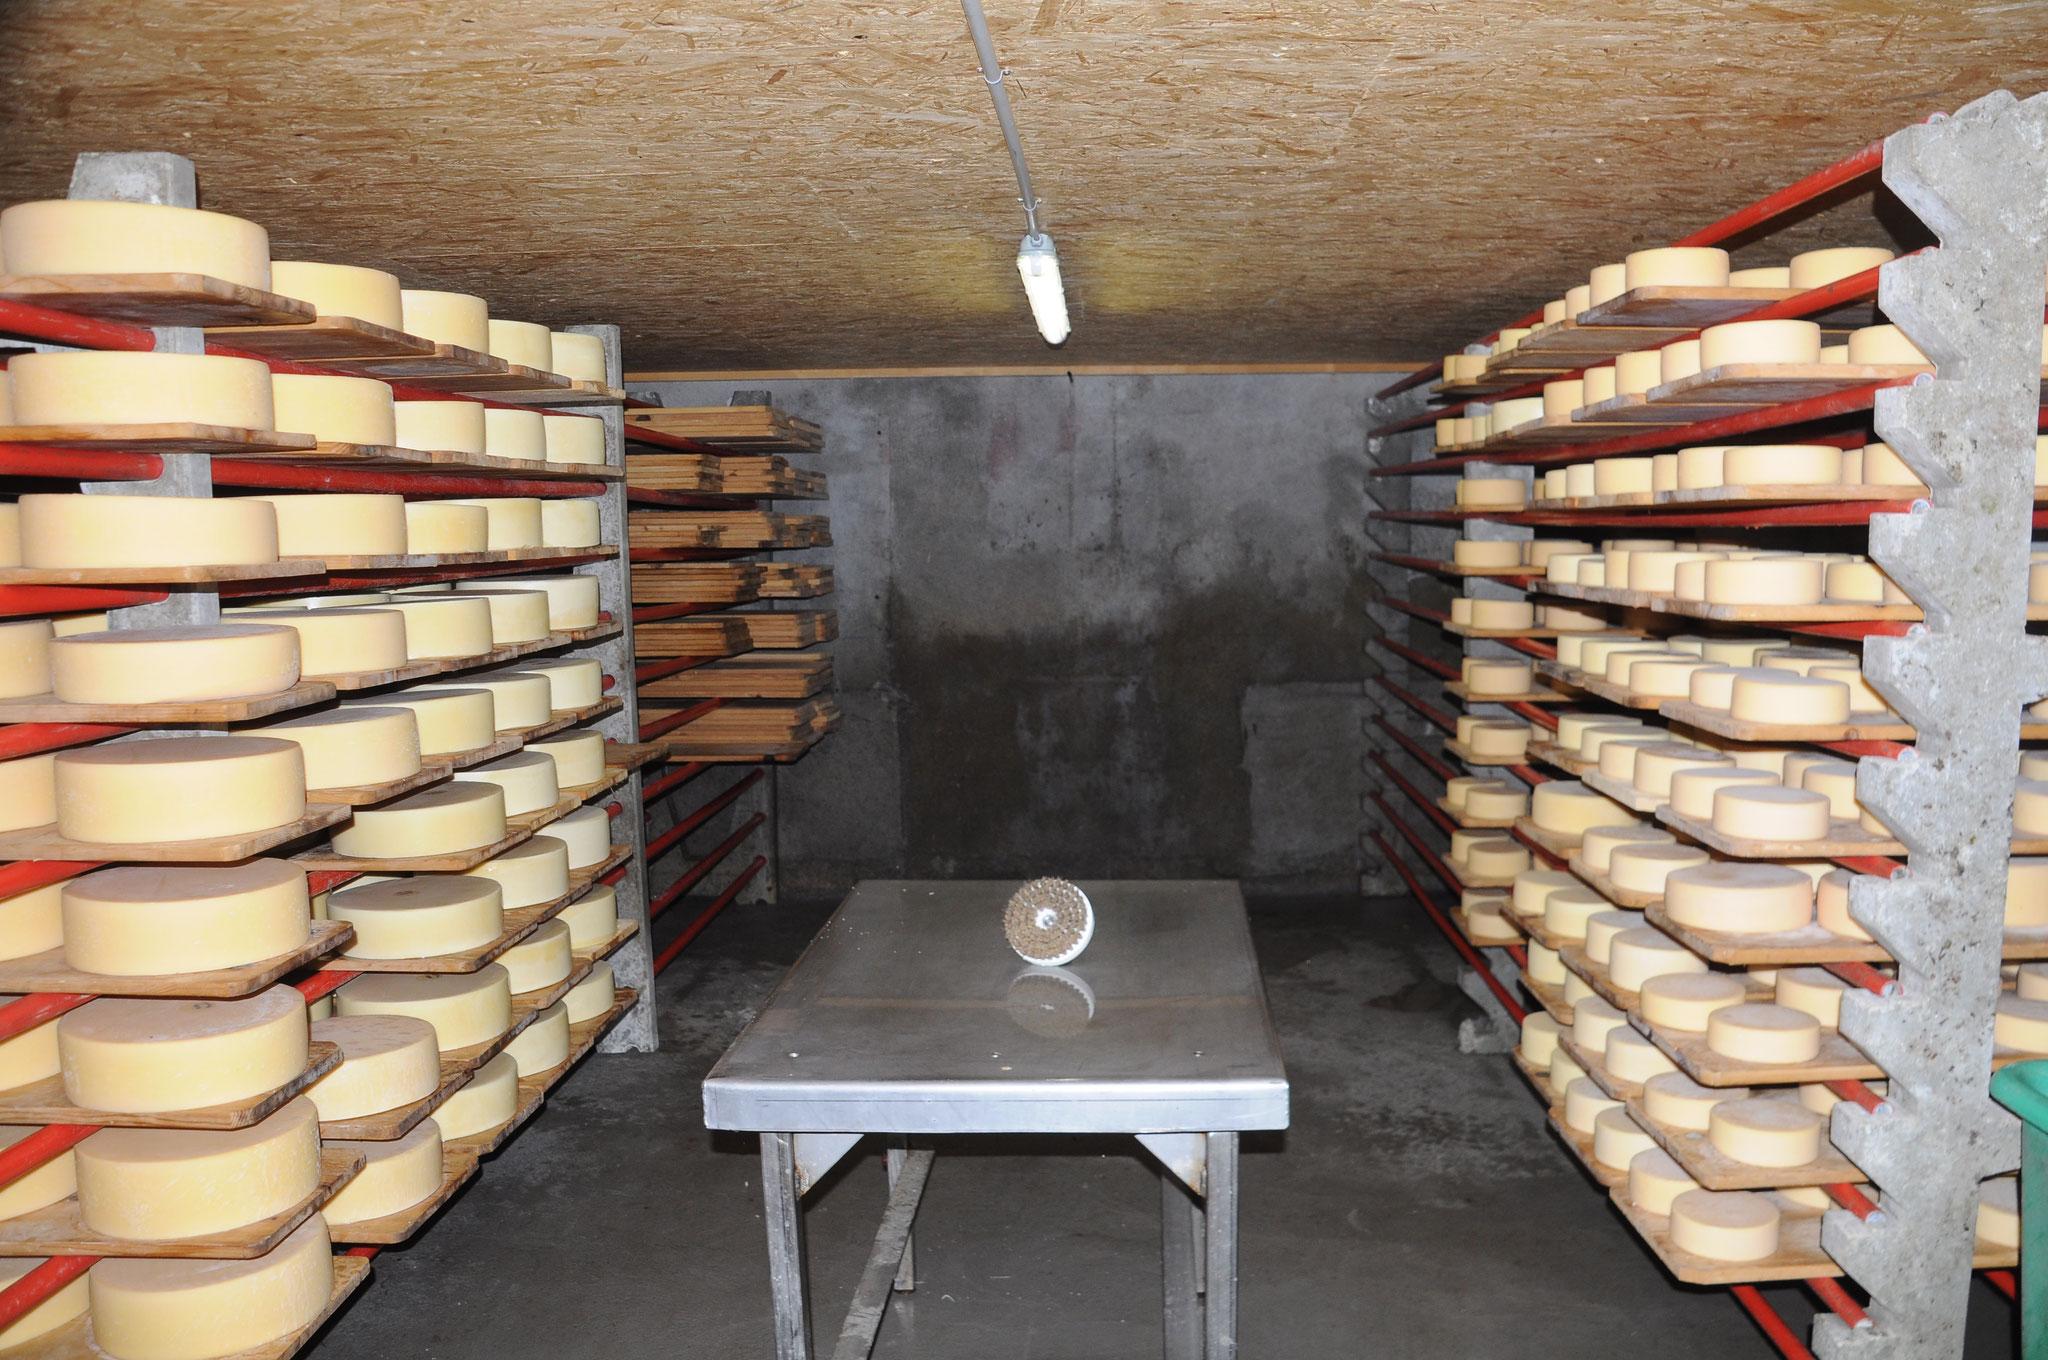 Der Keller, wo unser Käse lagert und reift.